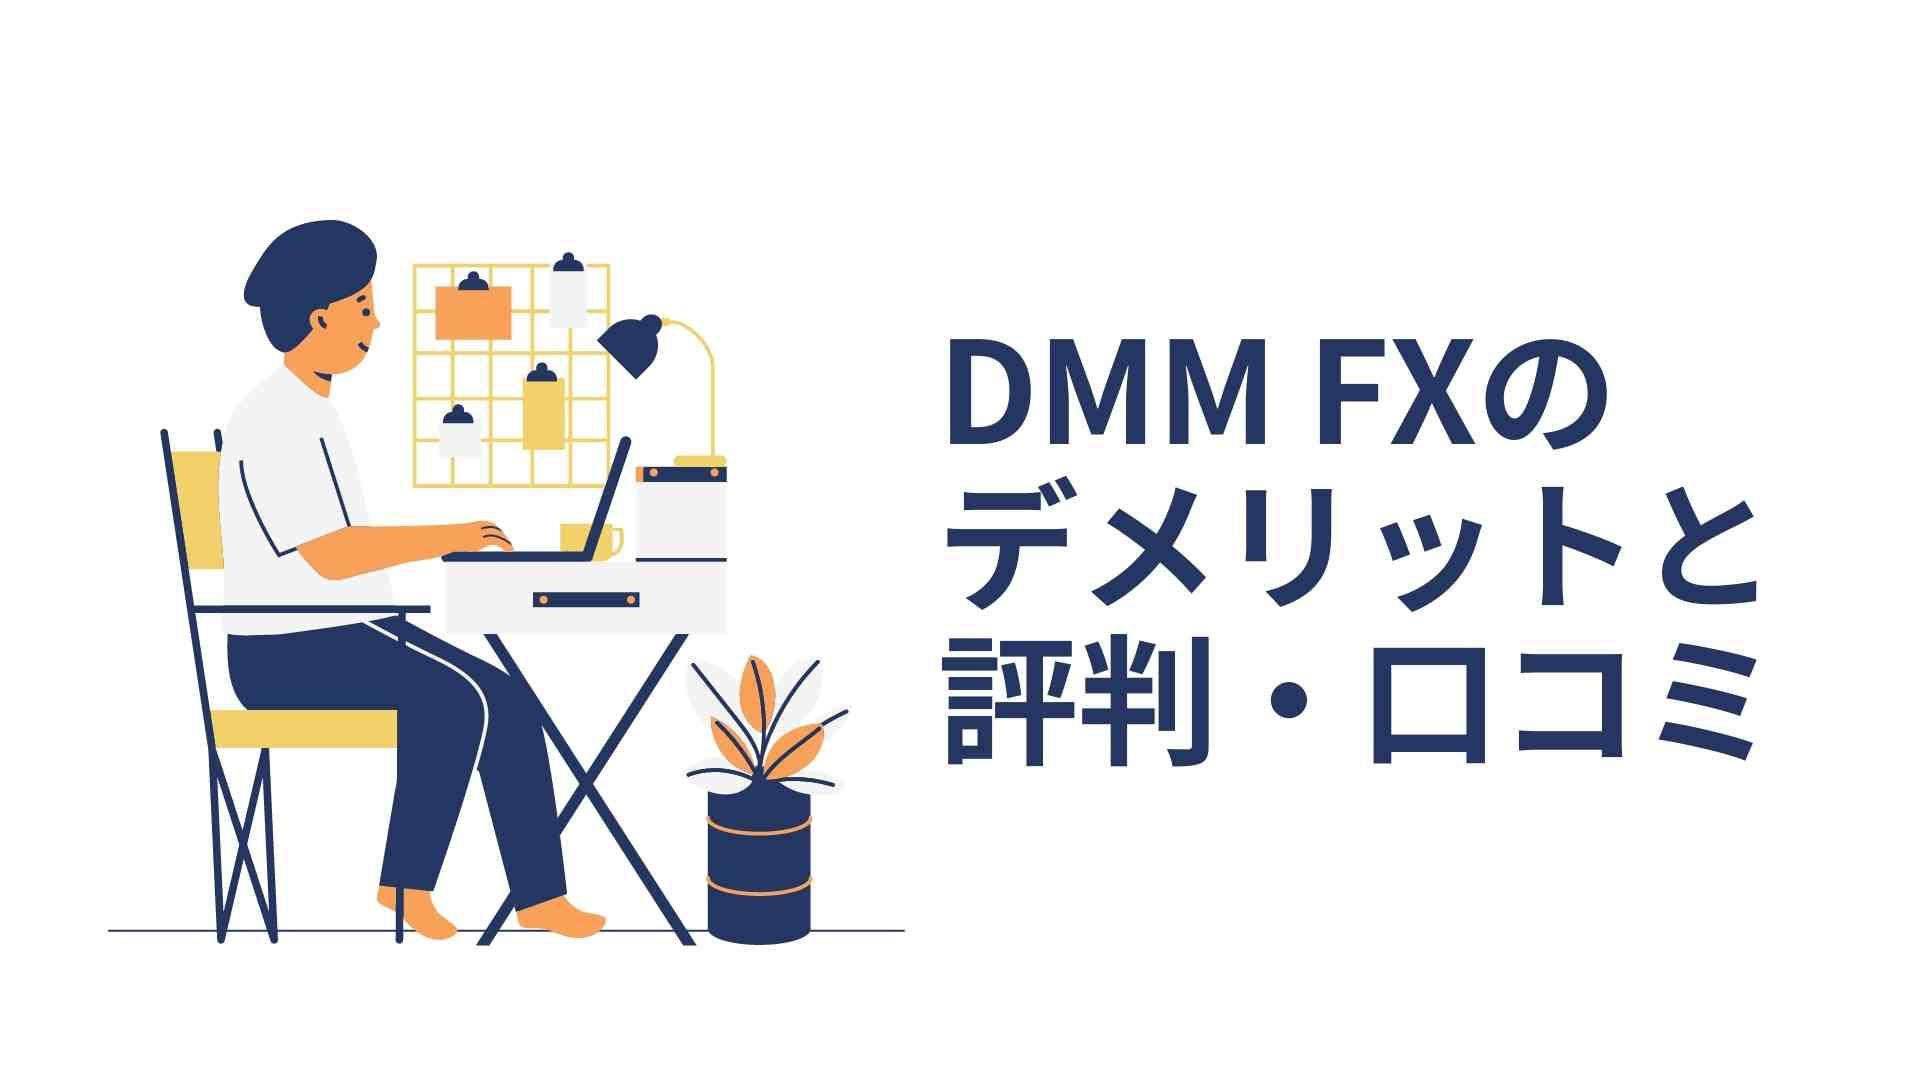 DMM FXのデメリットと評判・口コミ